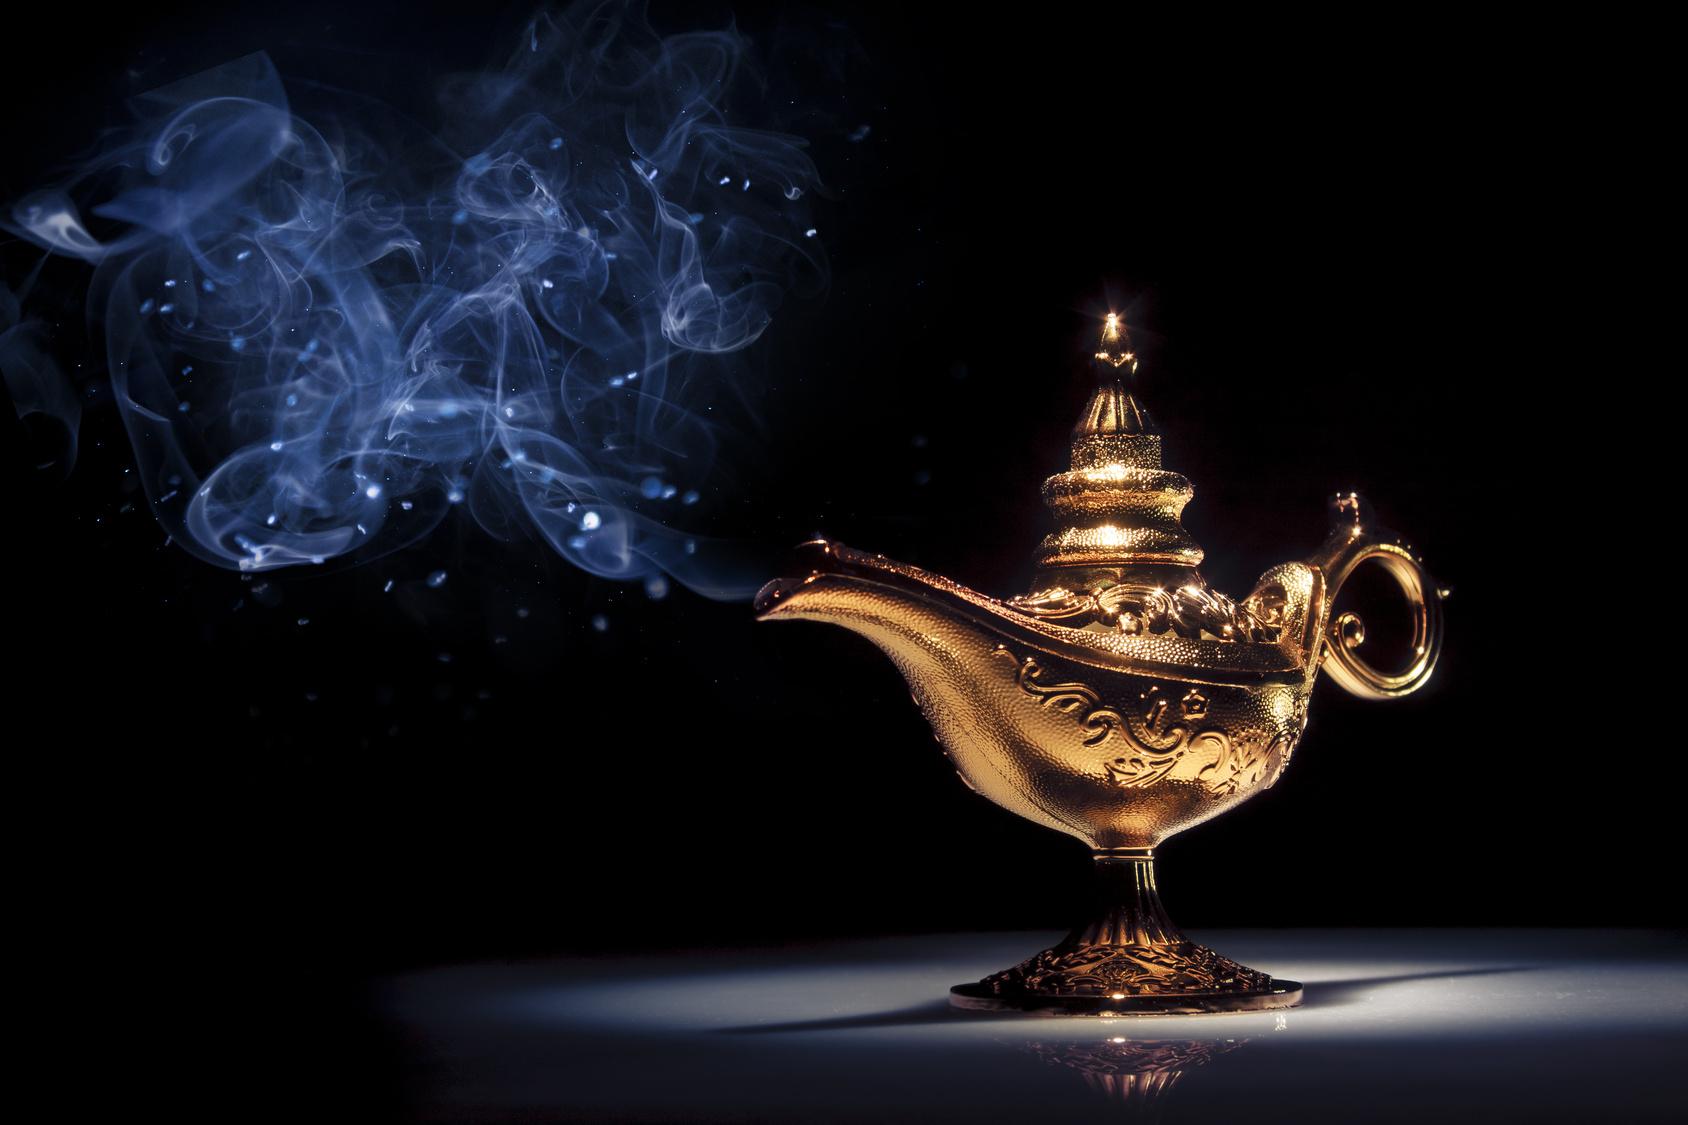 Genie Lamp clipart jeannie Images Magic 31626894 Images Image: